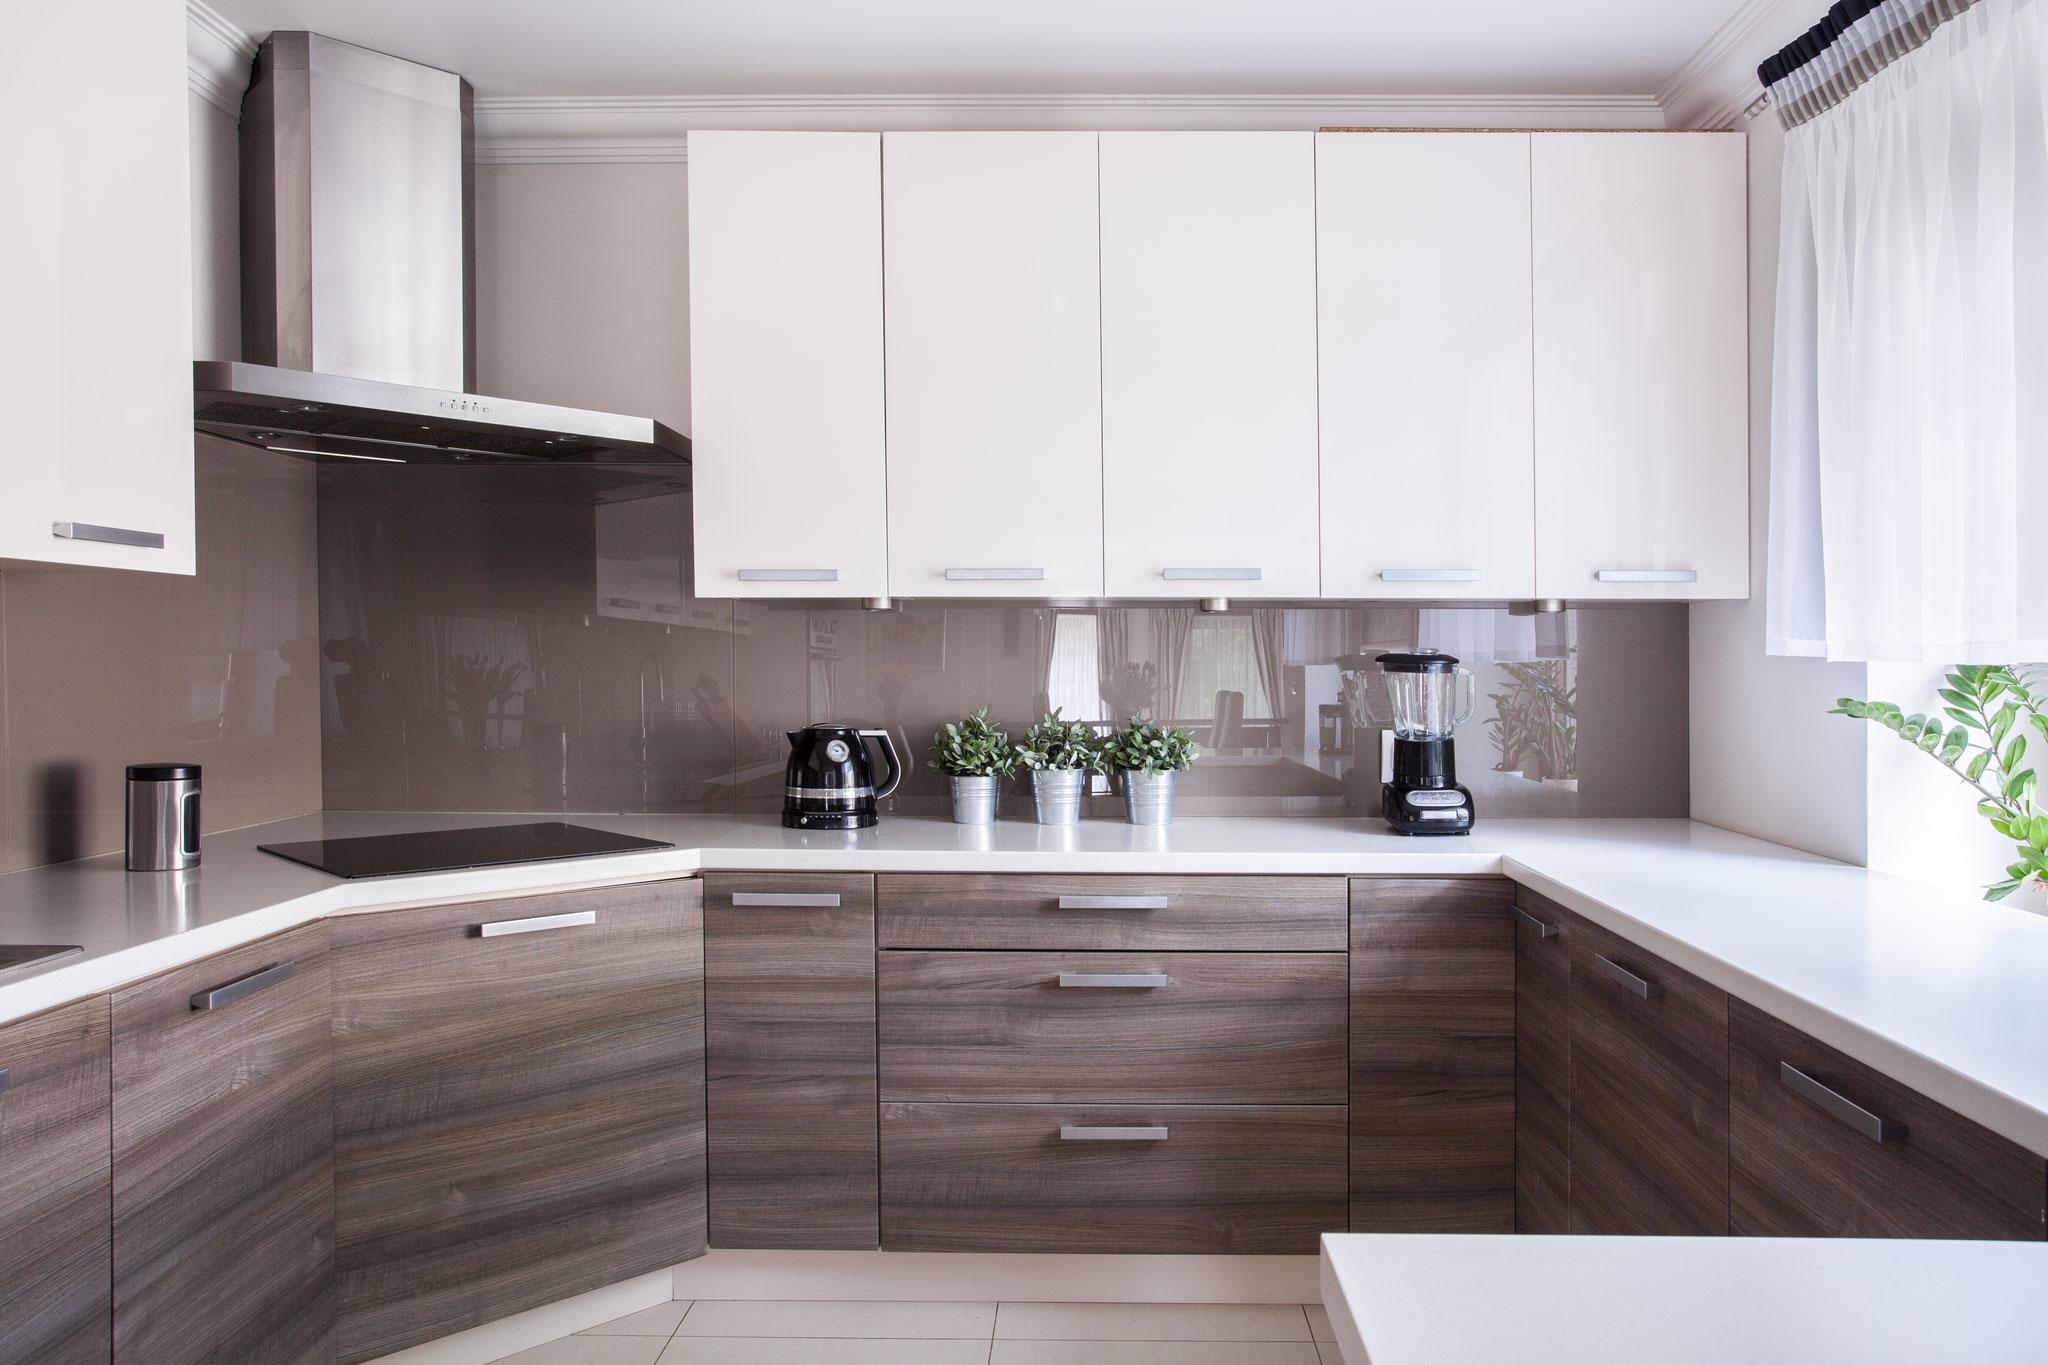 k chenr ckw nde aus glas delta glas gmbh in gr nstadt. Black Bedroom Furniture Sets. Home Design Ideas